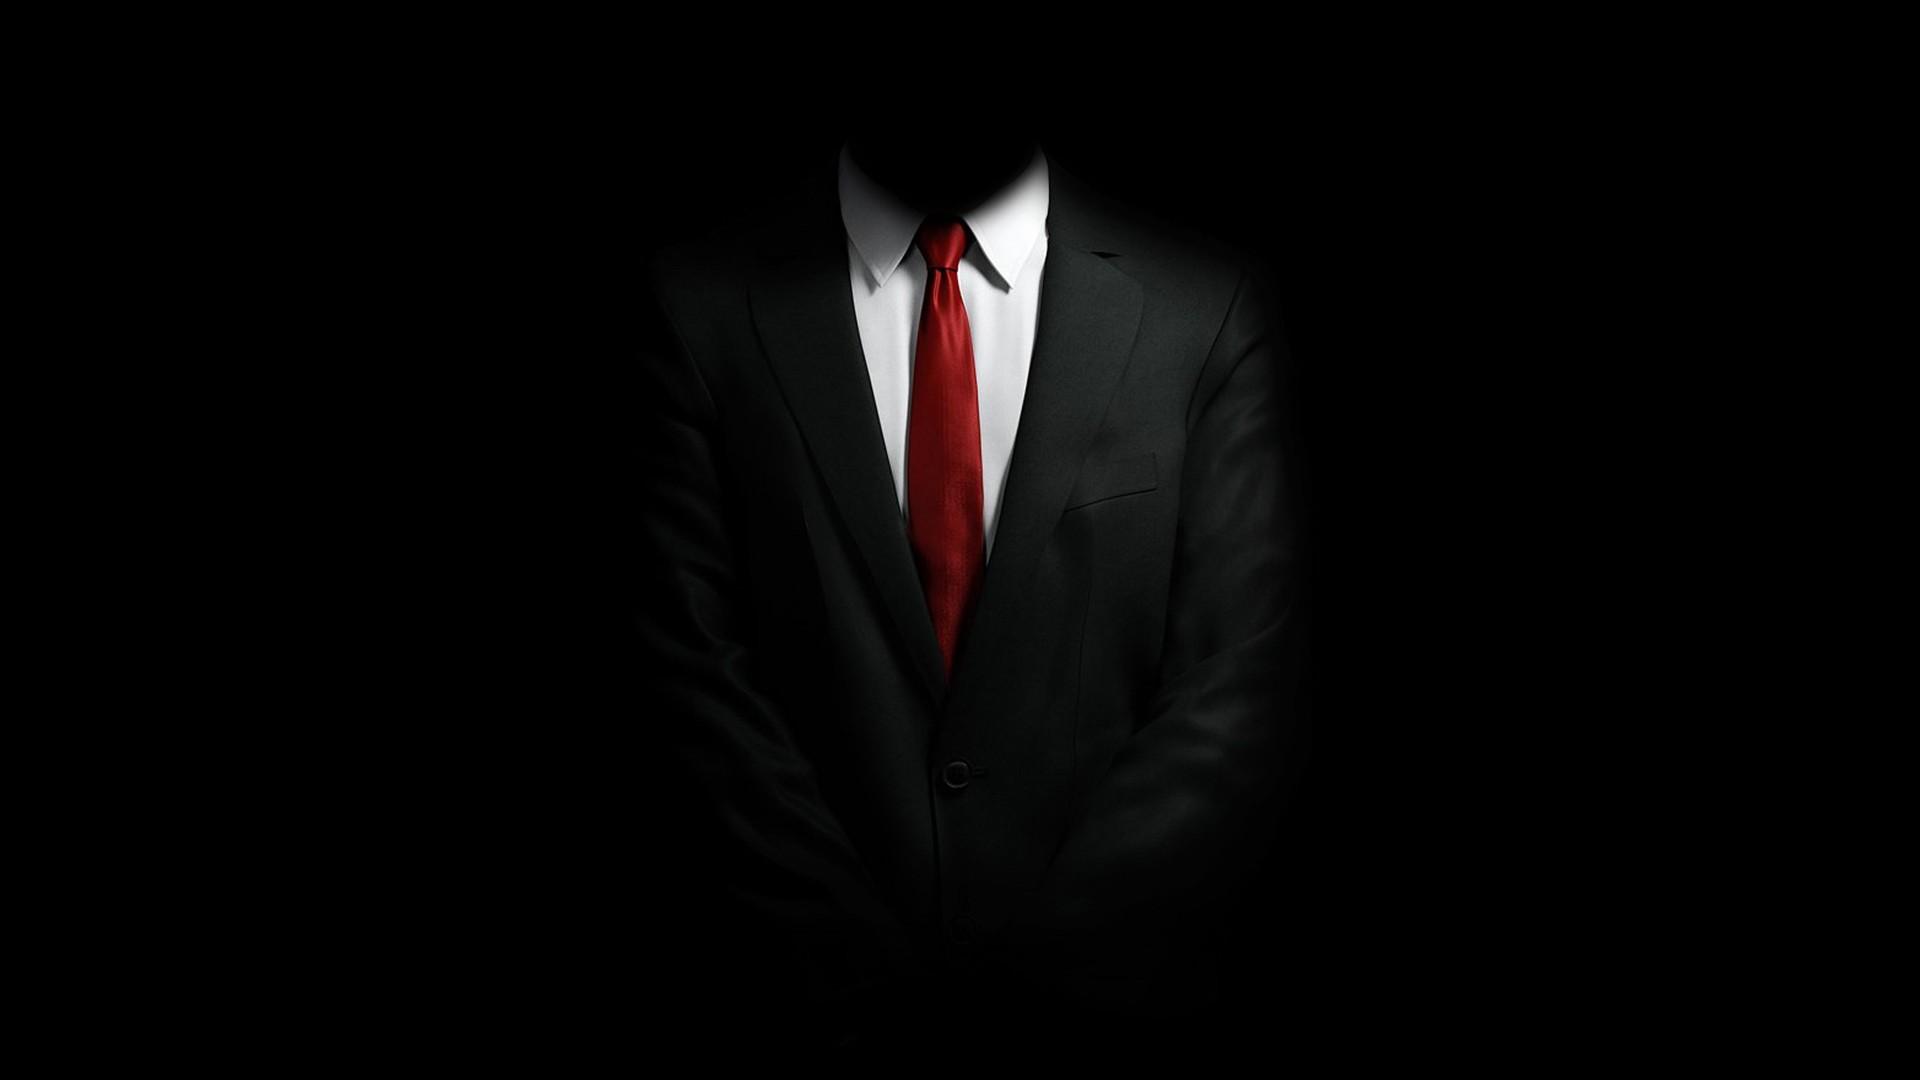 General 1920x1080 suits black background Hitman video games red tie Hitman: Absolution dark minimalism 47